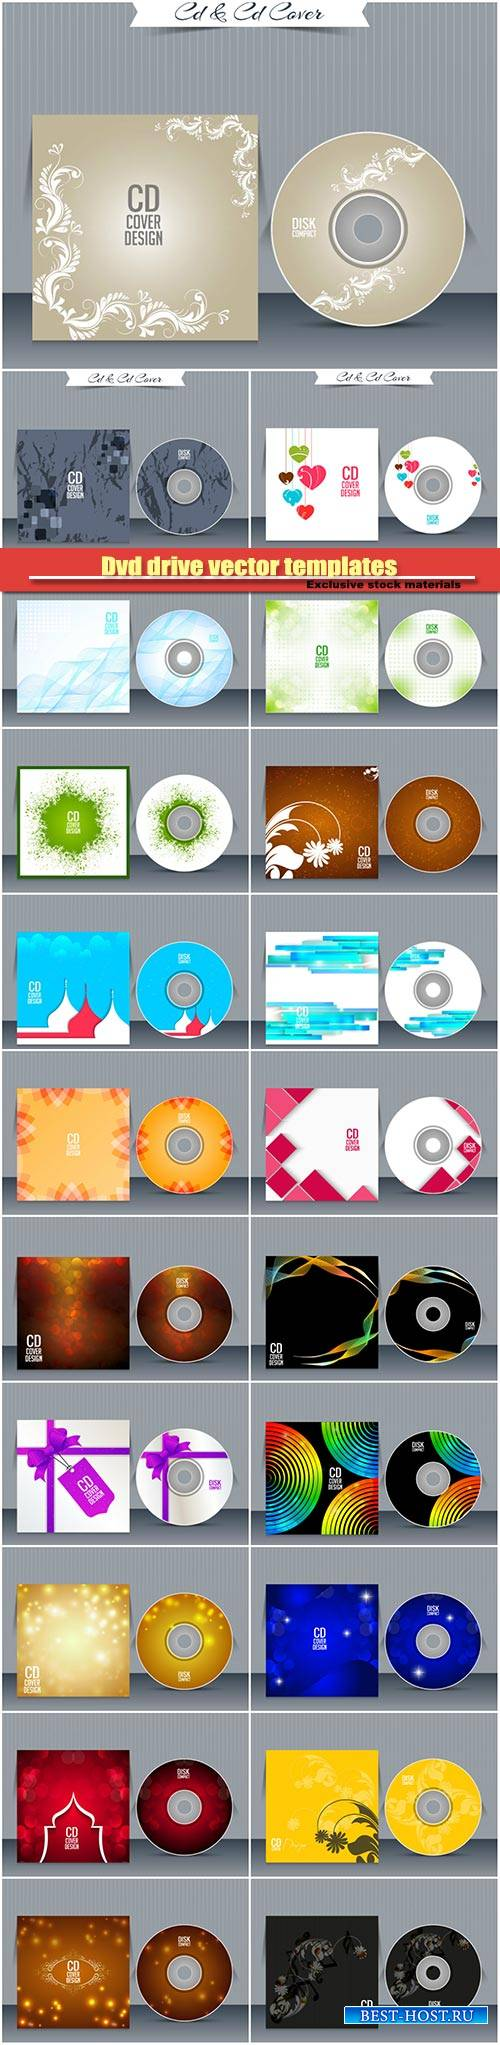 Dvd drive vector templates